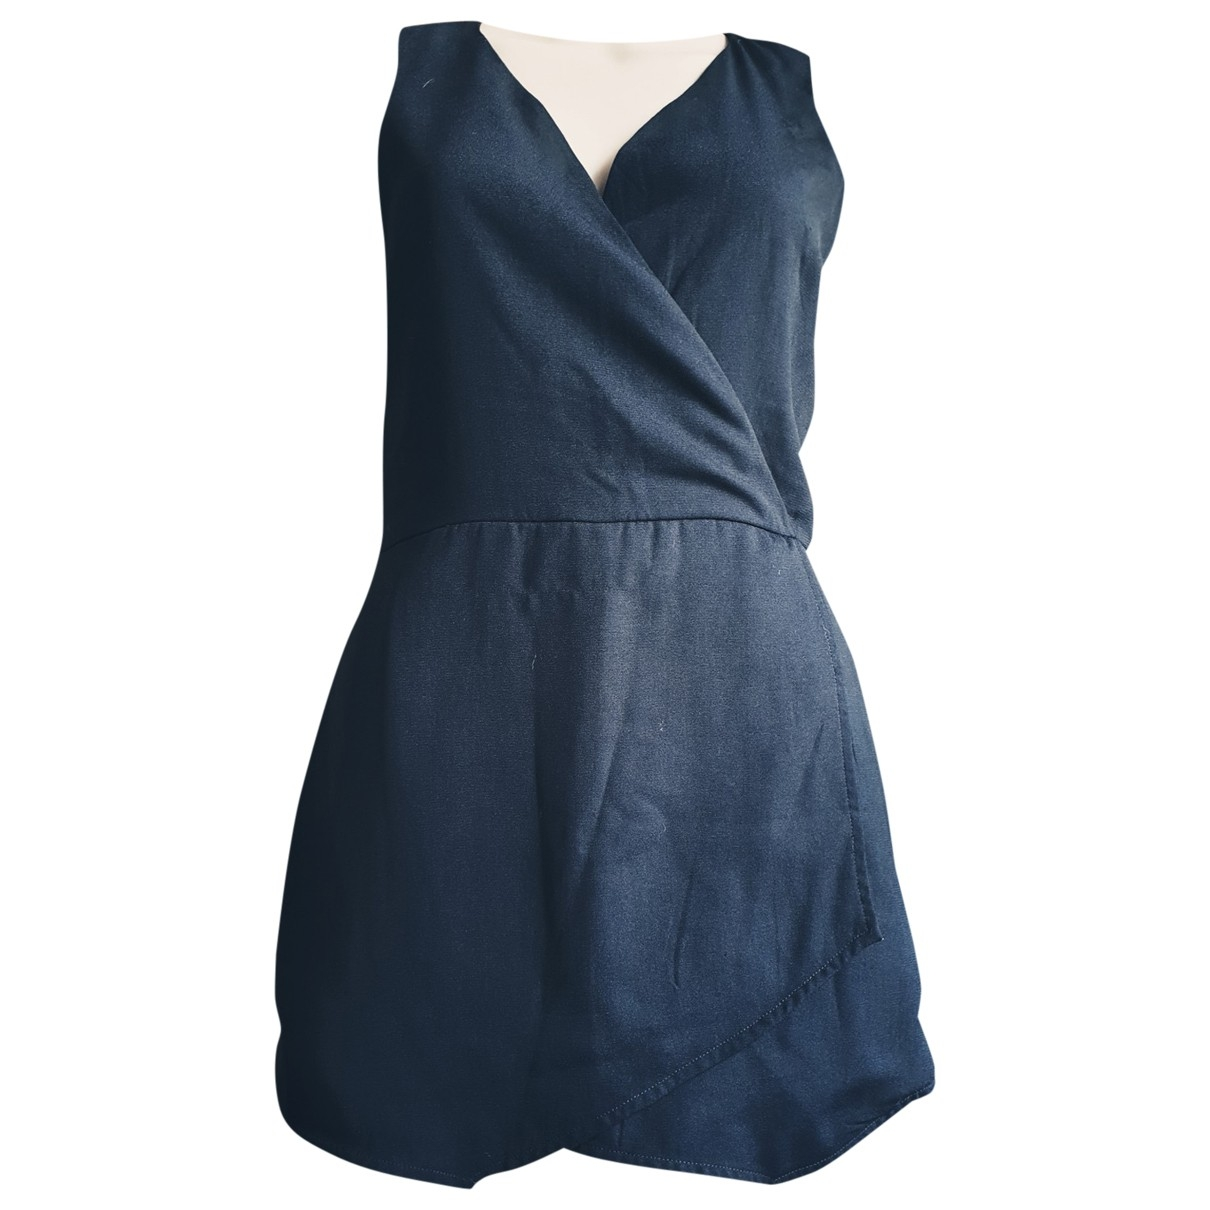 Abercrombie & Fitch \N Kleid in  Schwarz Polyester